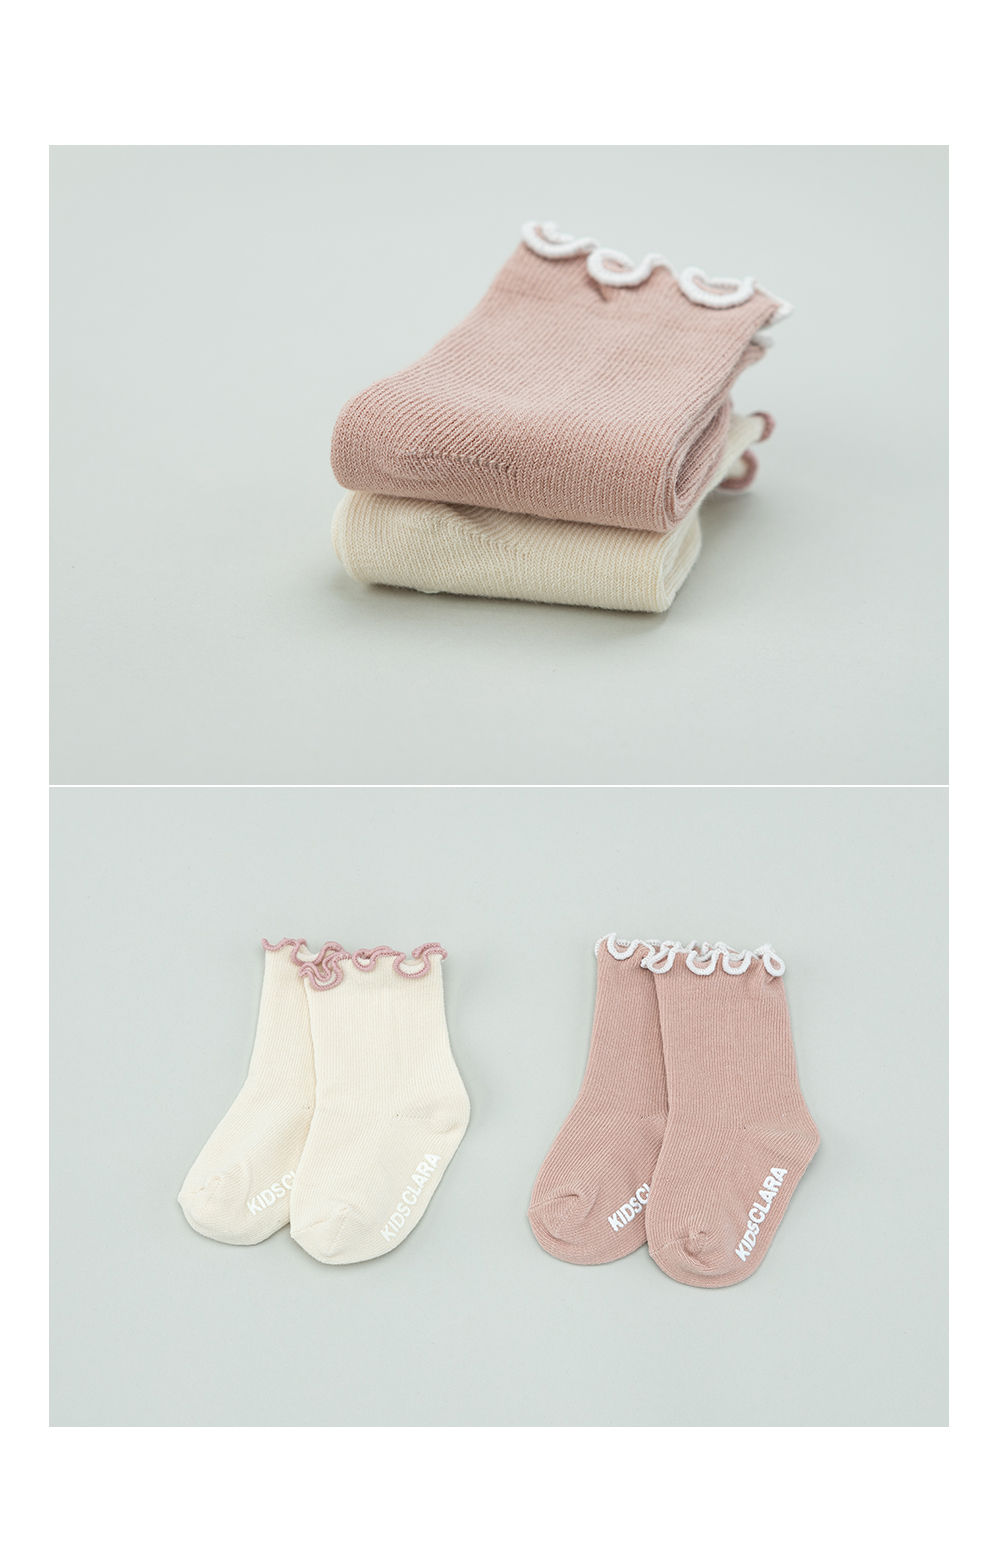 KIDS CLARA - Korean Children Fashion - #Kfashion4kids - Bobo Baby Socks [set of 5] - 3